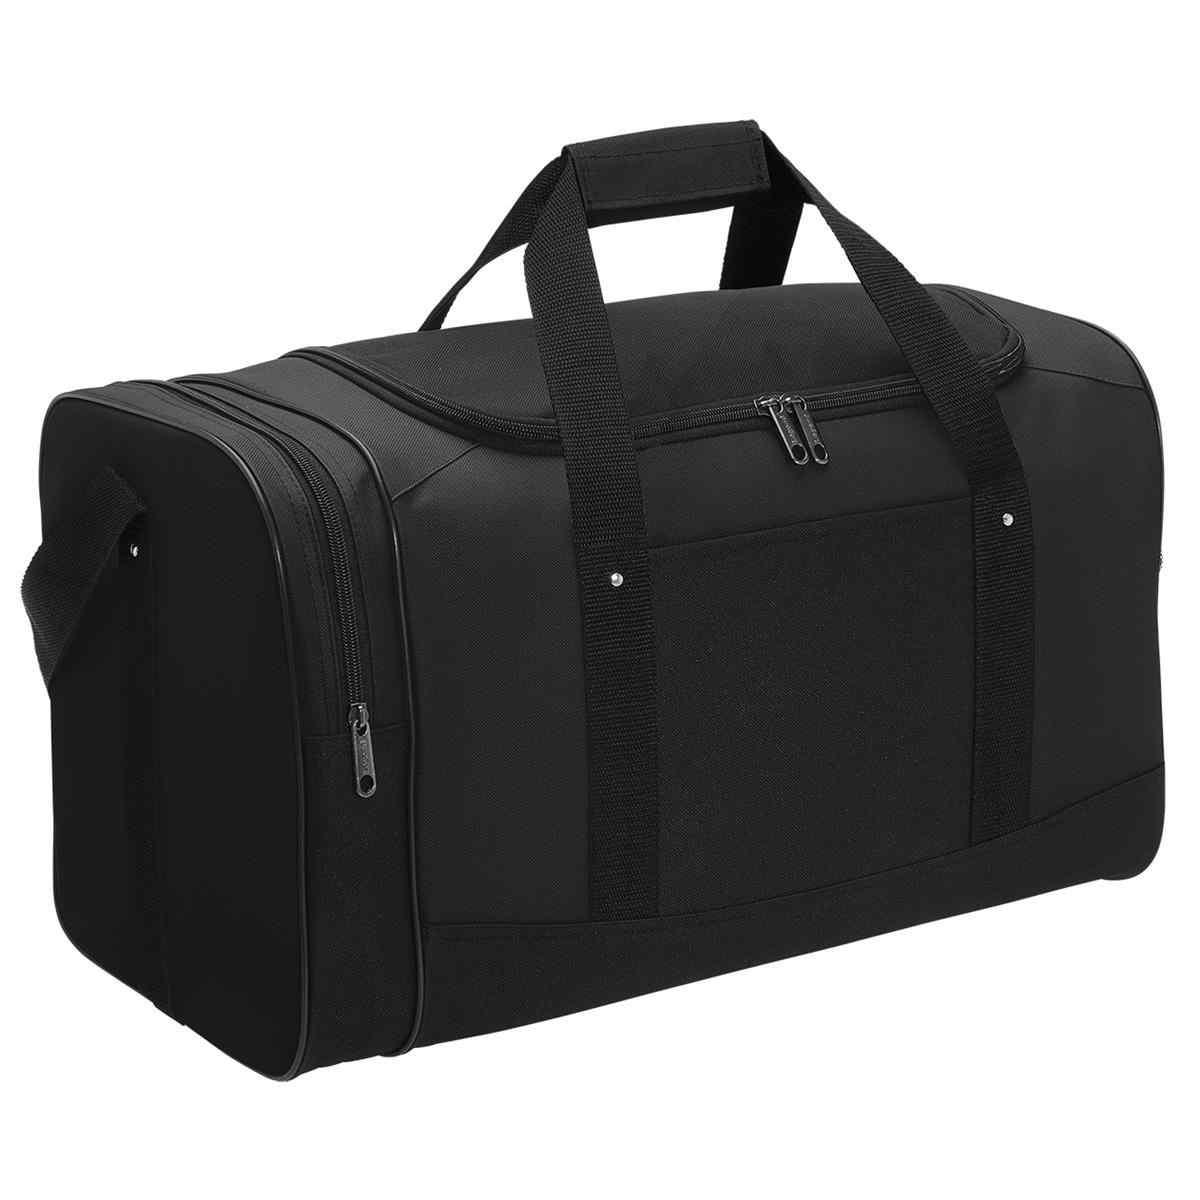 1222 Spark Sports Bag